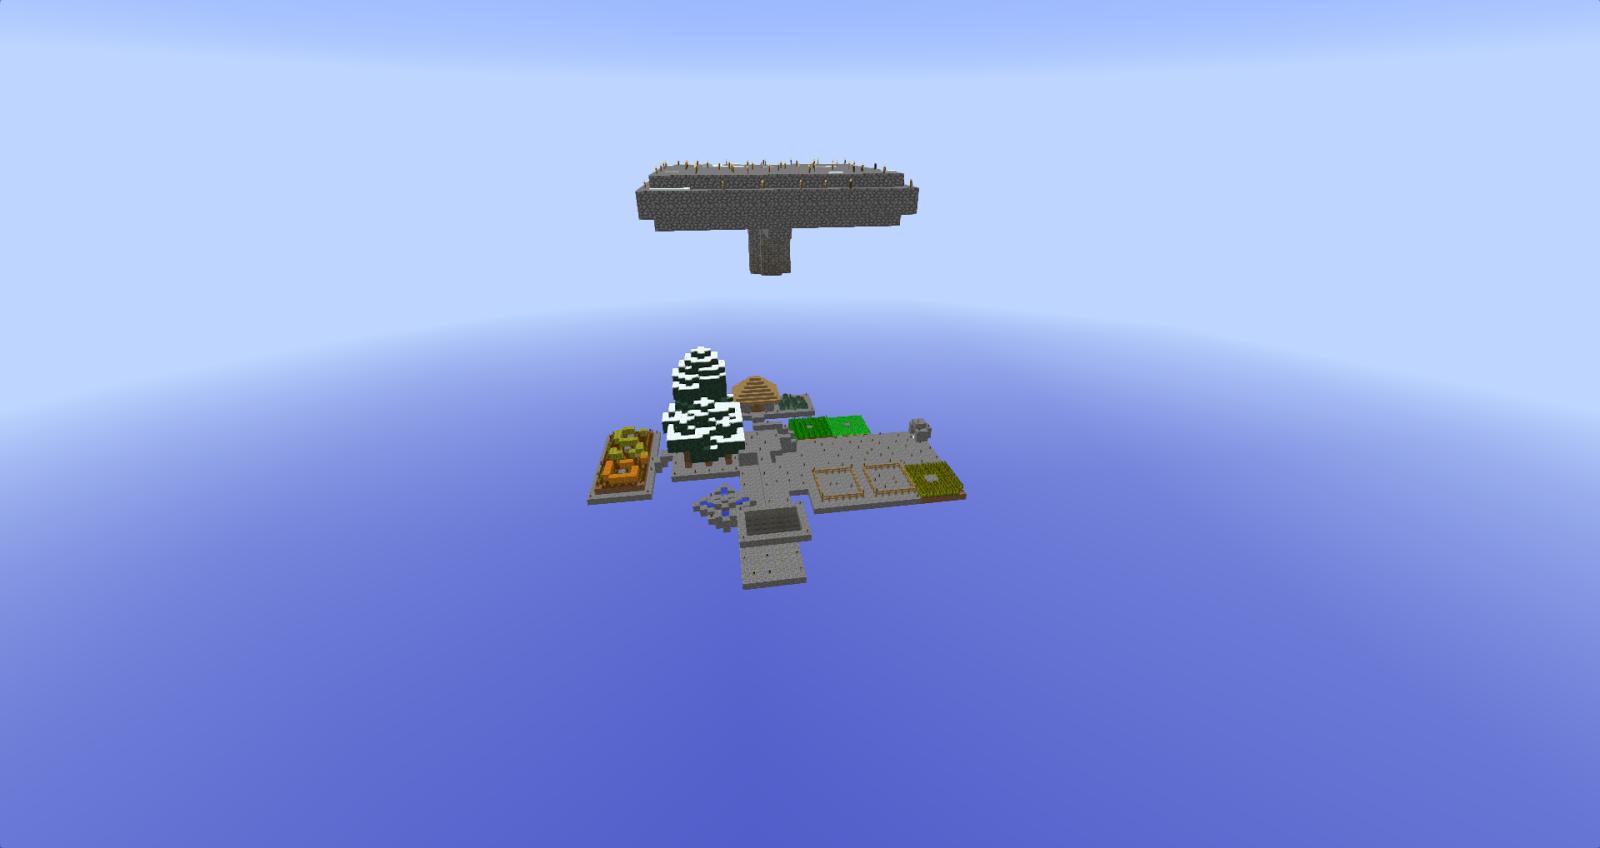 MineCraft SkyBlock: My SkyBlock World